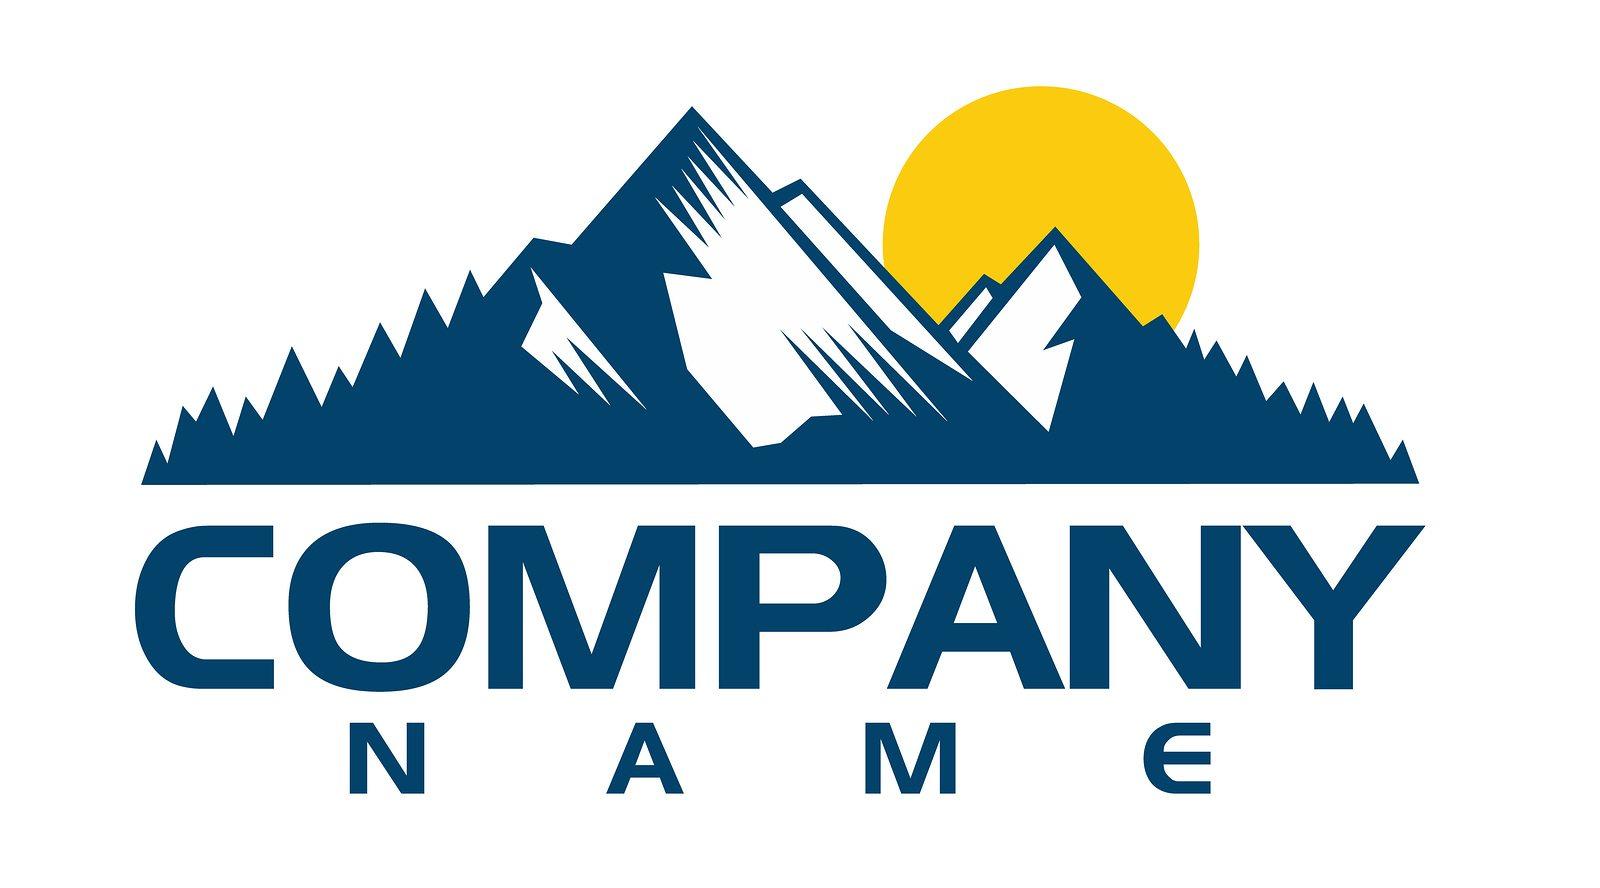 Mountain logo template. Vector design element modern style for logotype, label, badge, emblem. Mountain logo, hills logo, mountain symbol, mountain icon, rock climber logo.